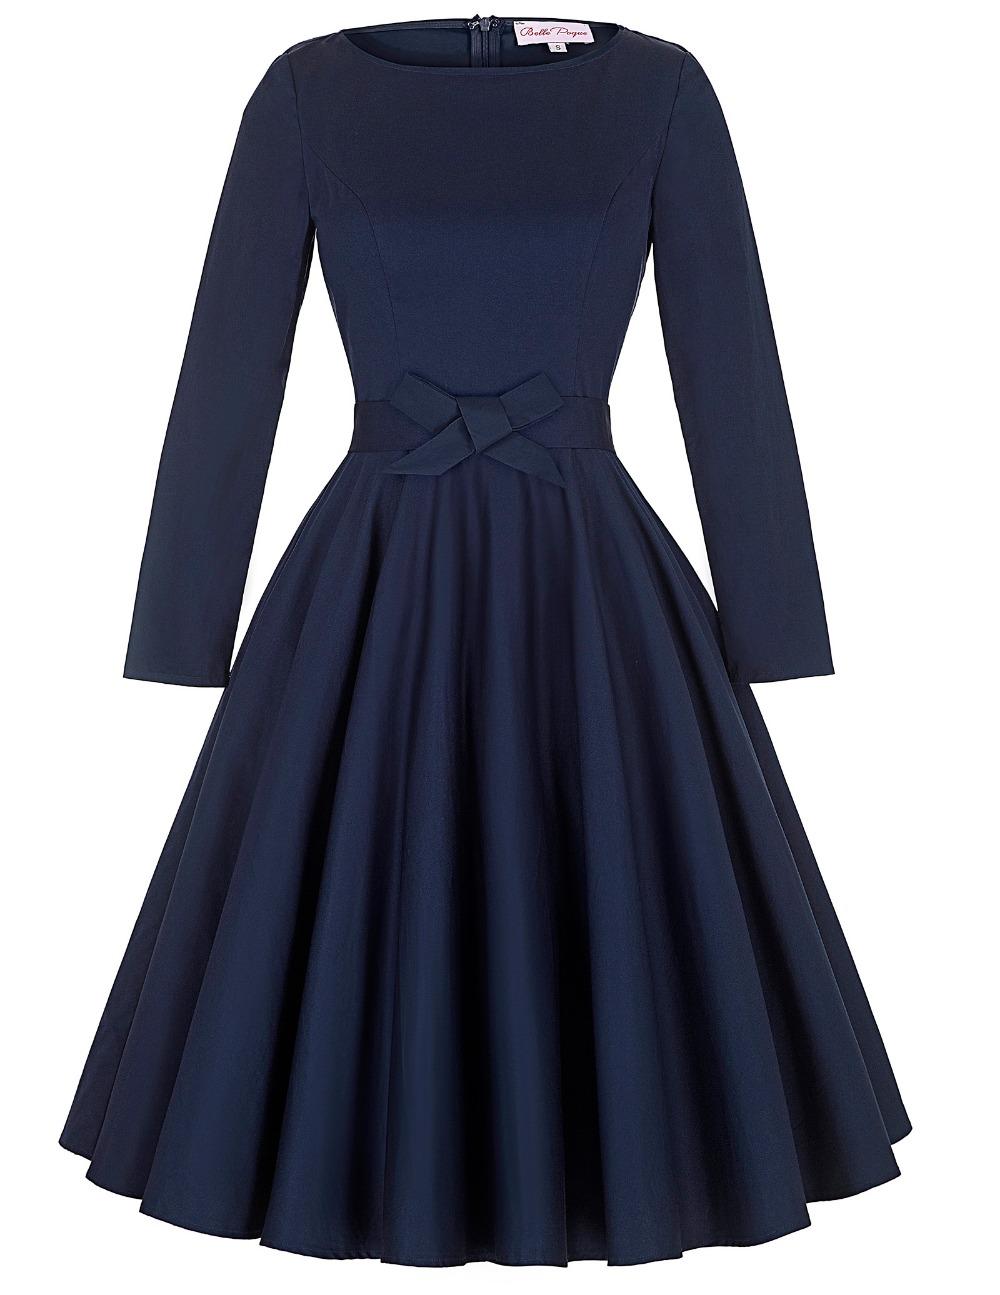 buy women vintage 50s retro robe rockabilly dress 2016 plus size elegant office. Black Bedroom Furniture Sets. Home Design Ideas